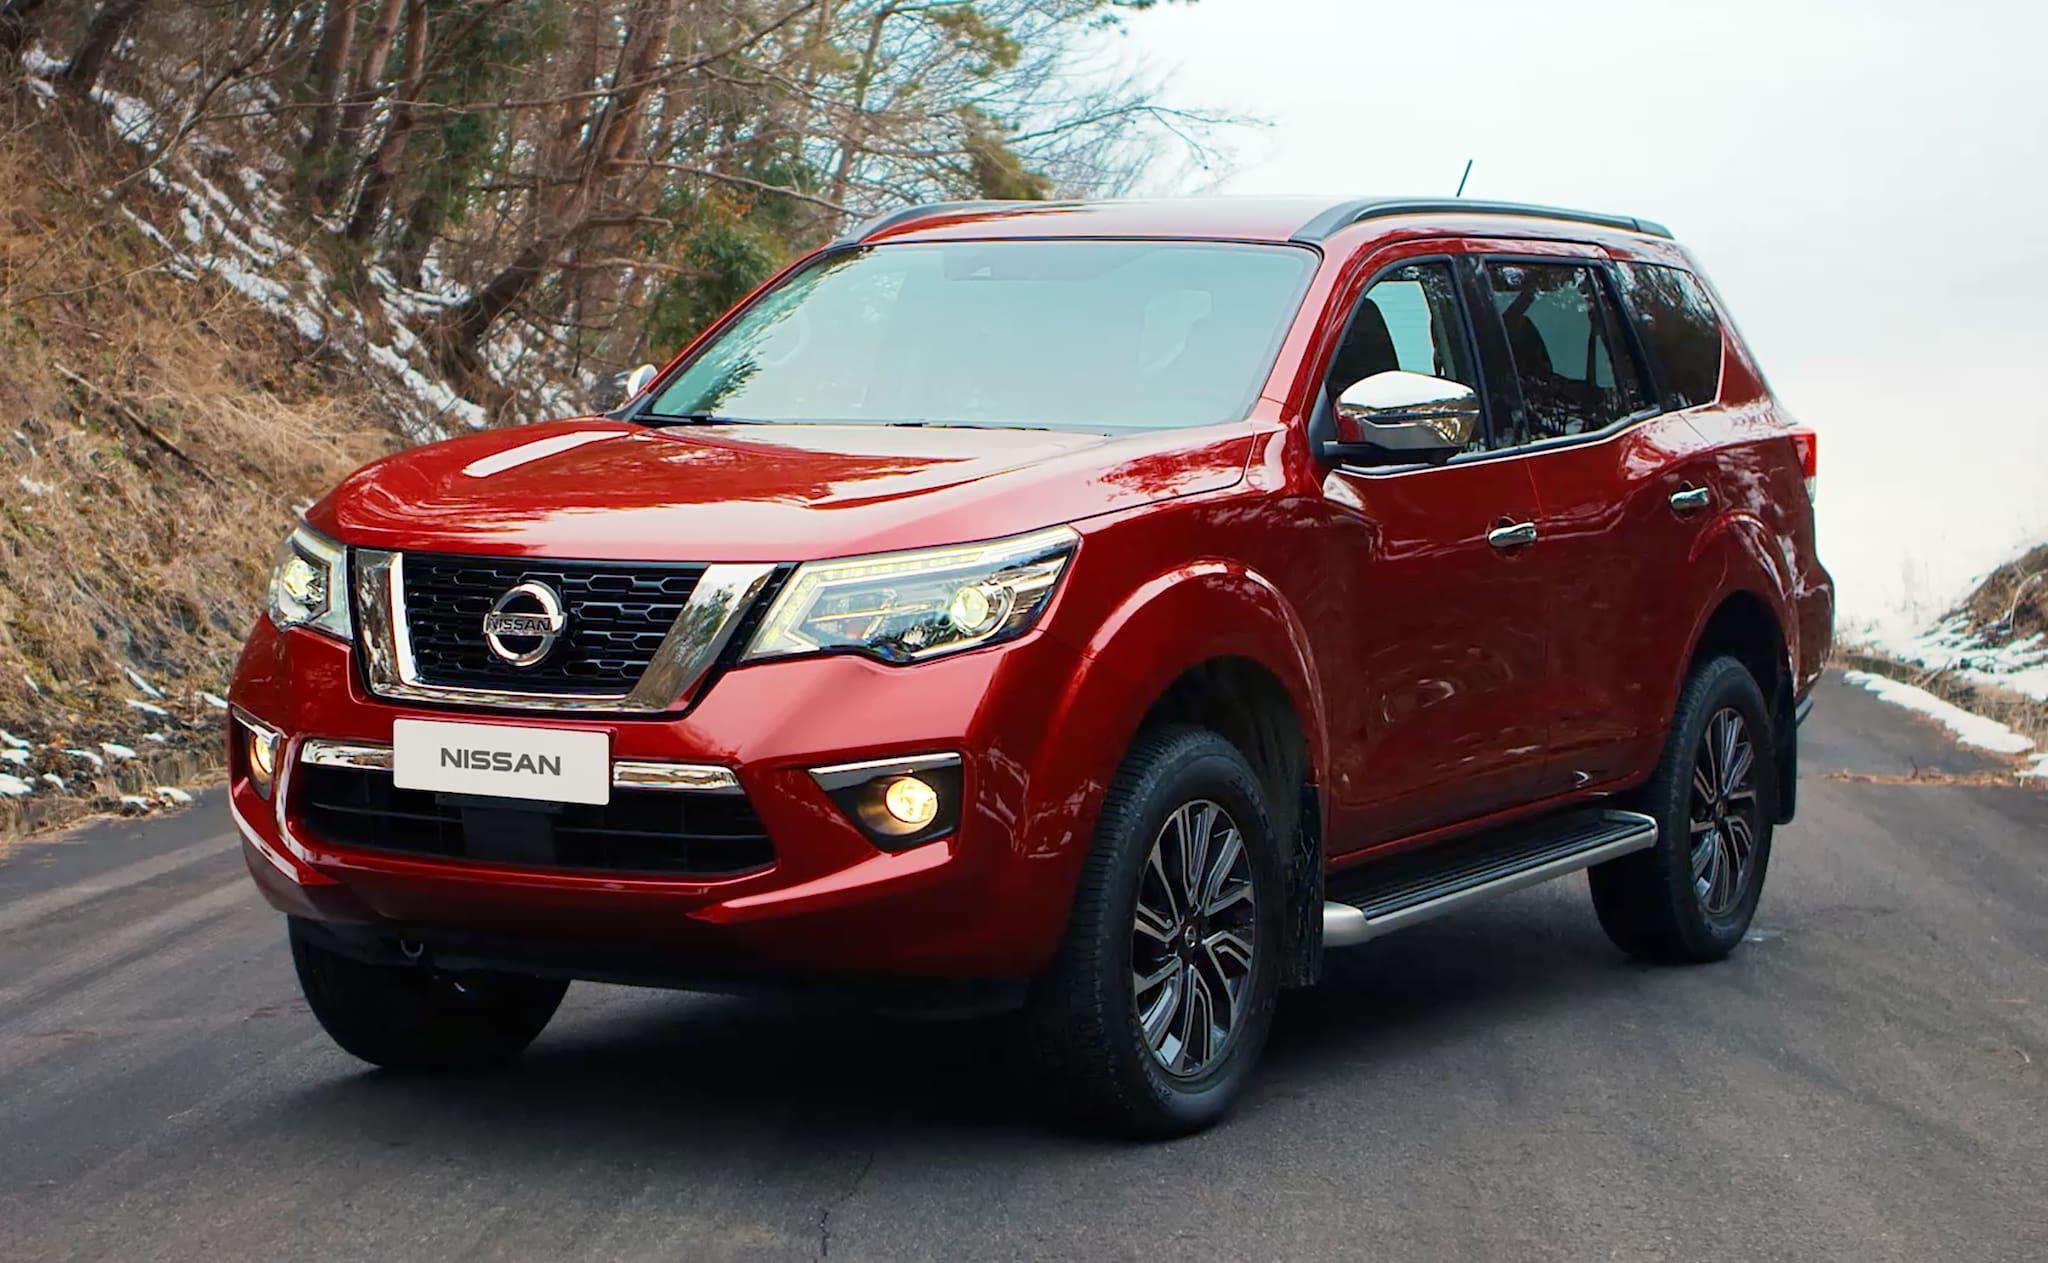 Nissan Finally Launches Navara-Based Nissan Terra for Asian Market